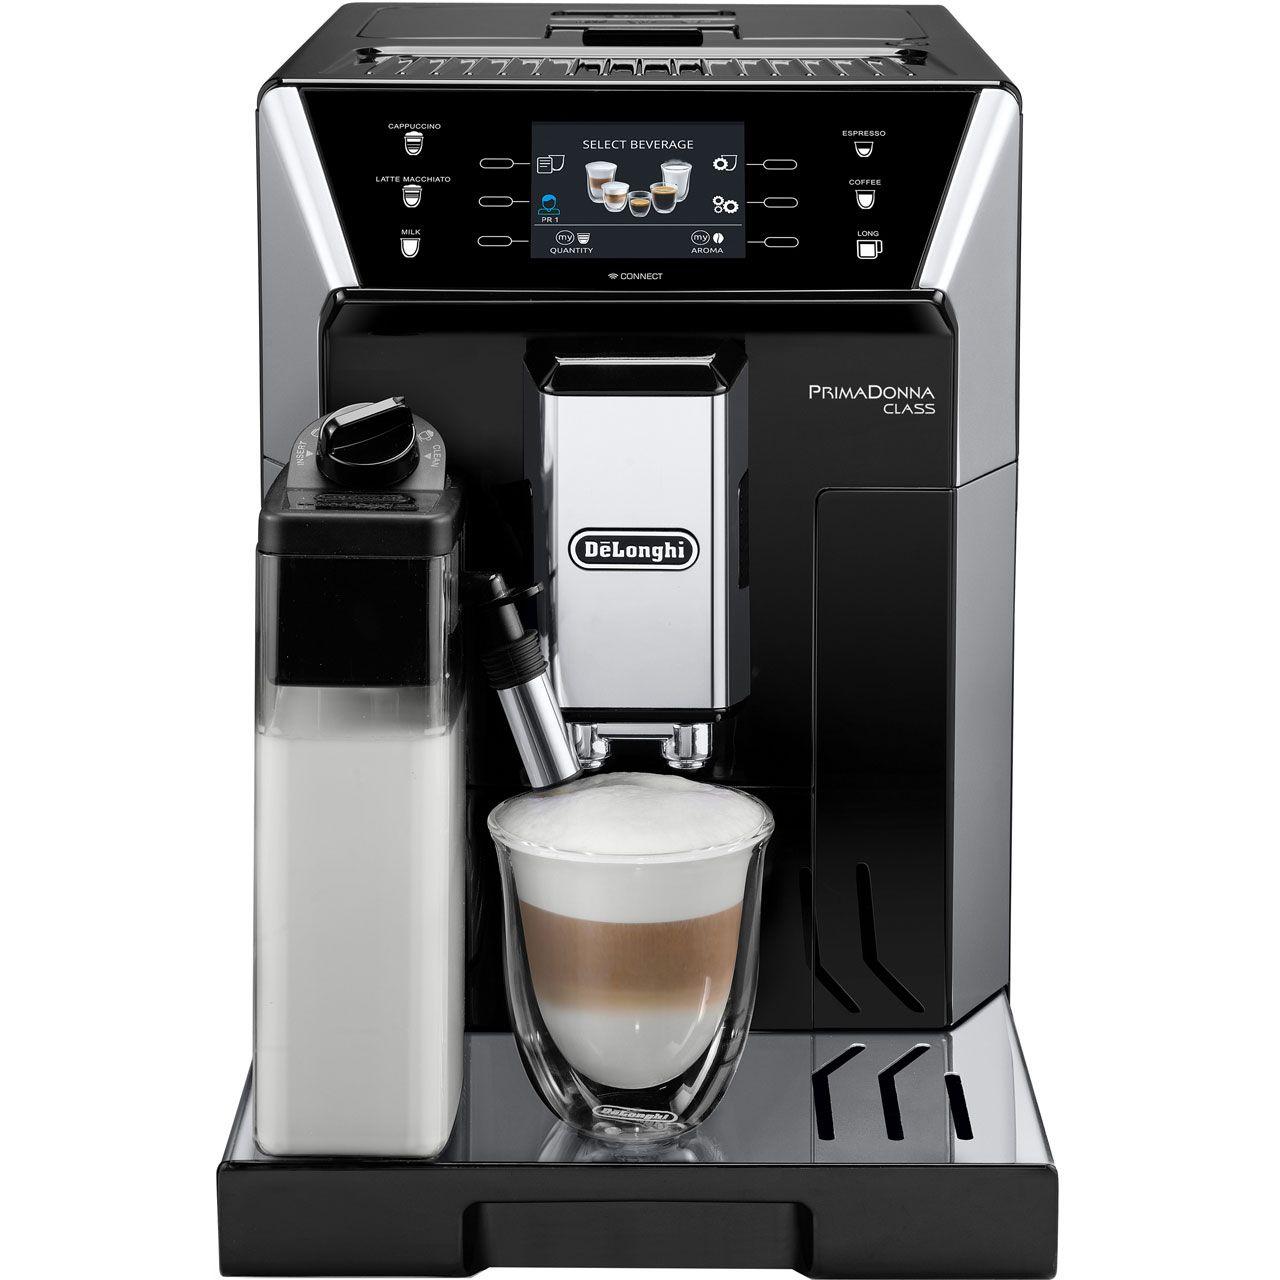 Delonghi Prima Donna class ECAM550.55.SB bean to cup coffee machine only £499.99 @ Costco